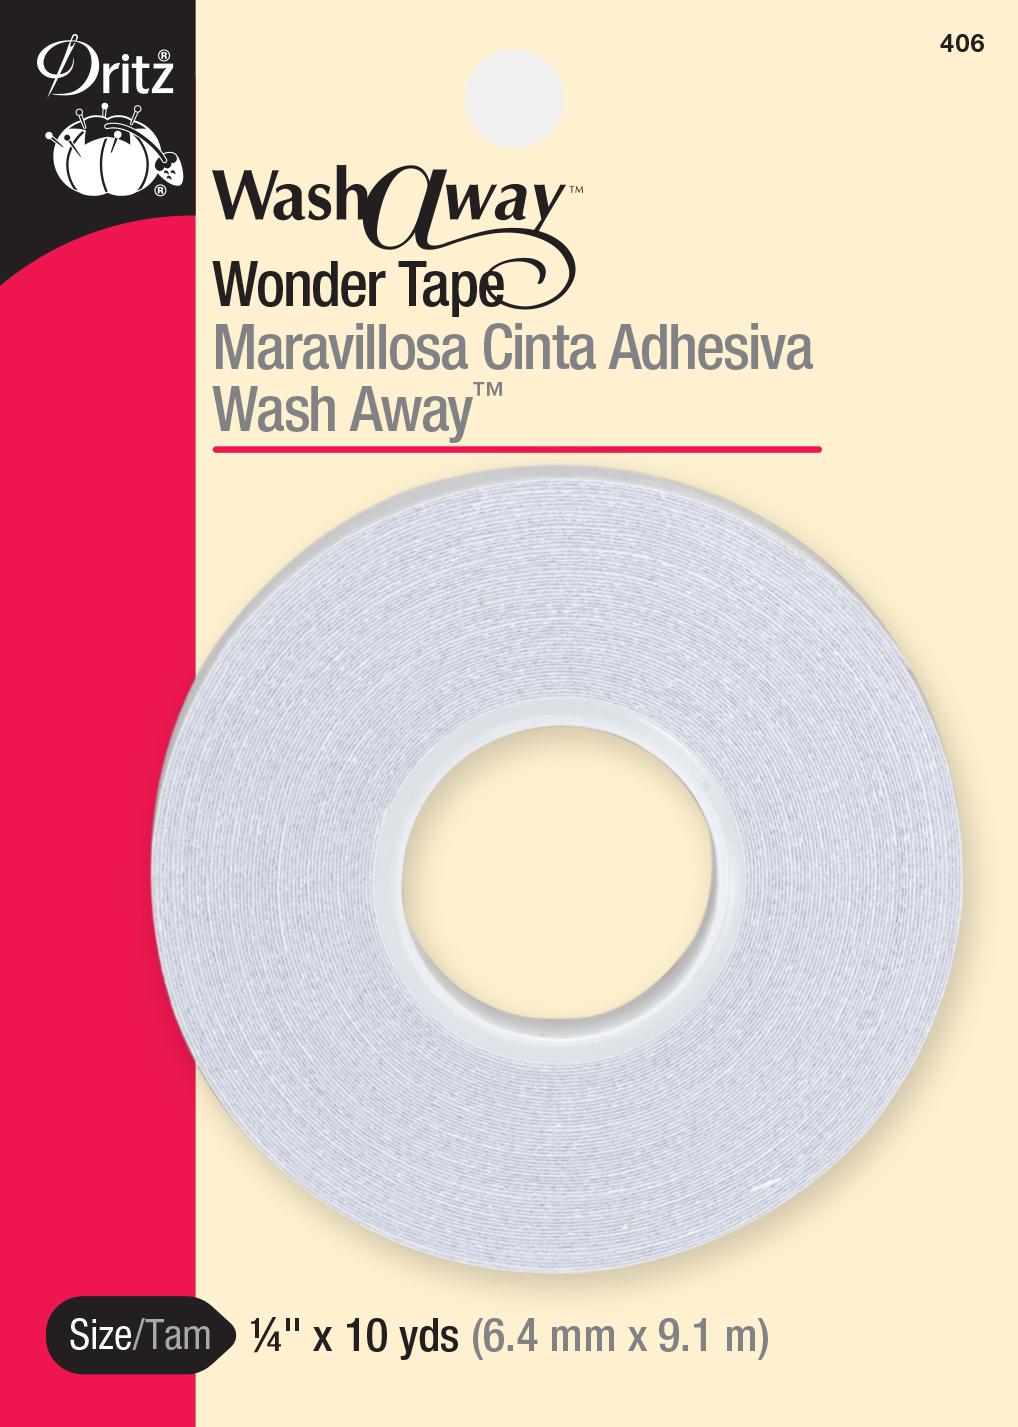 Dritz Wash Away Wonder Tape